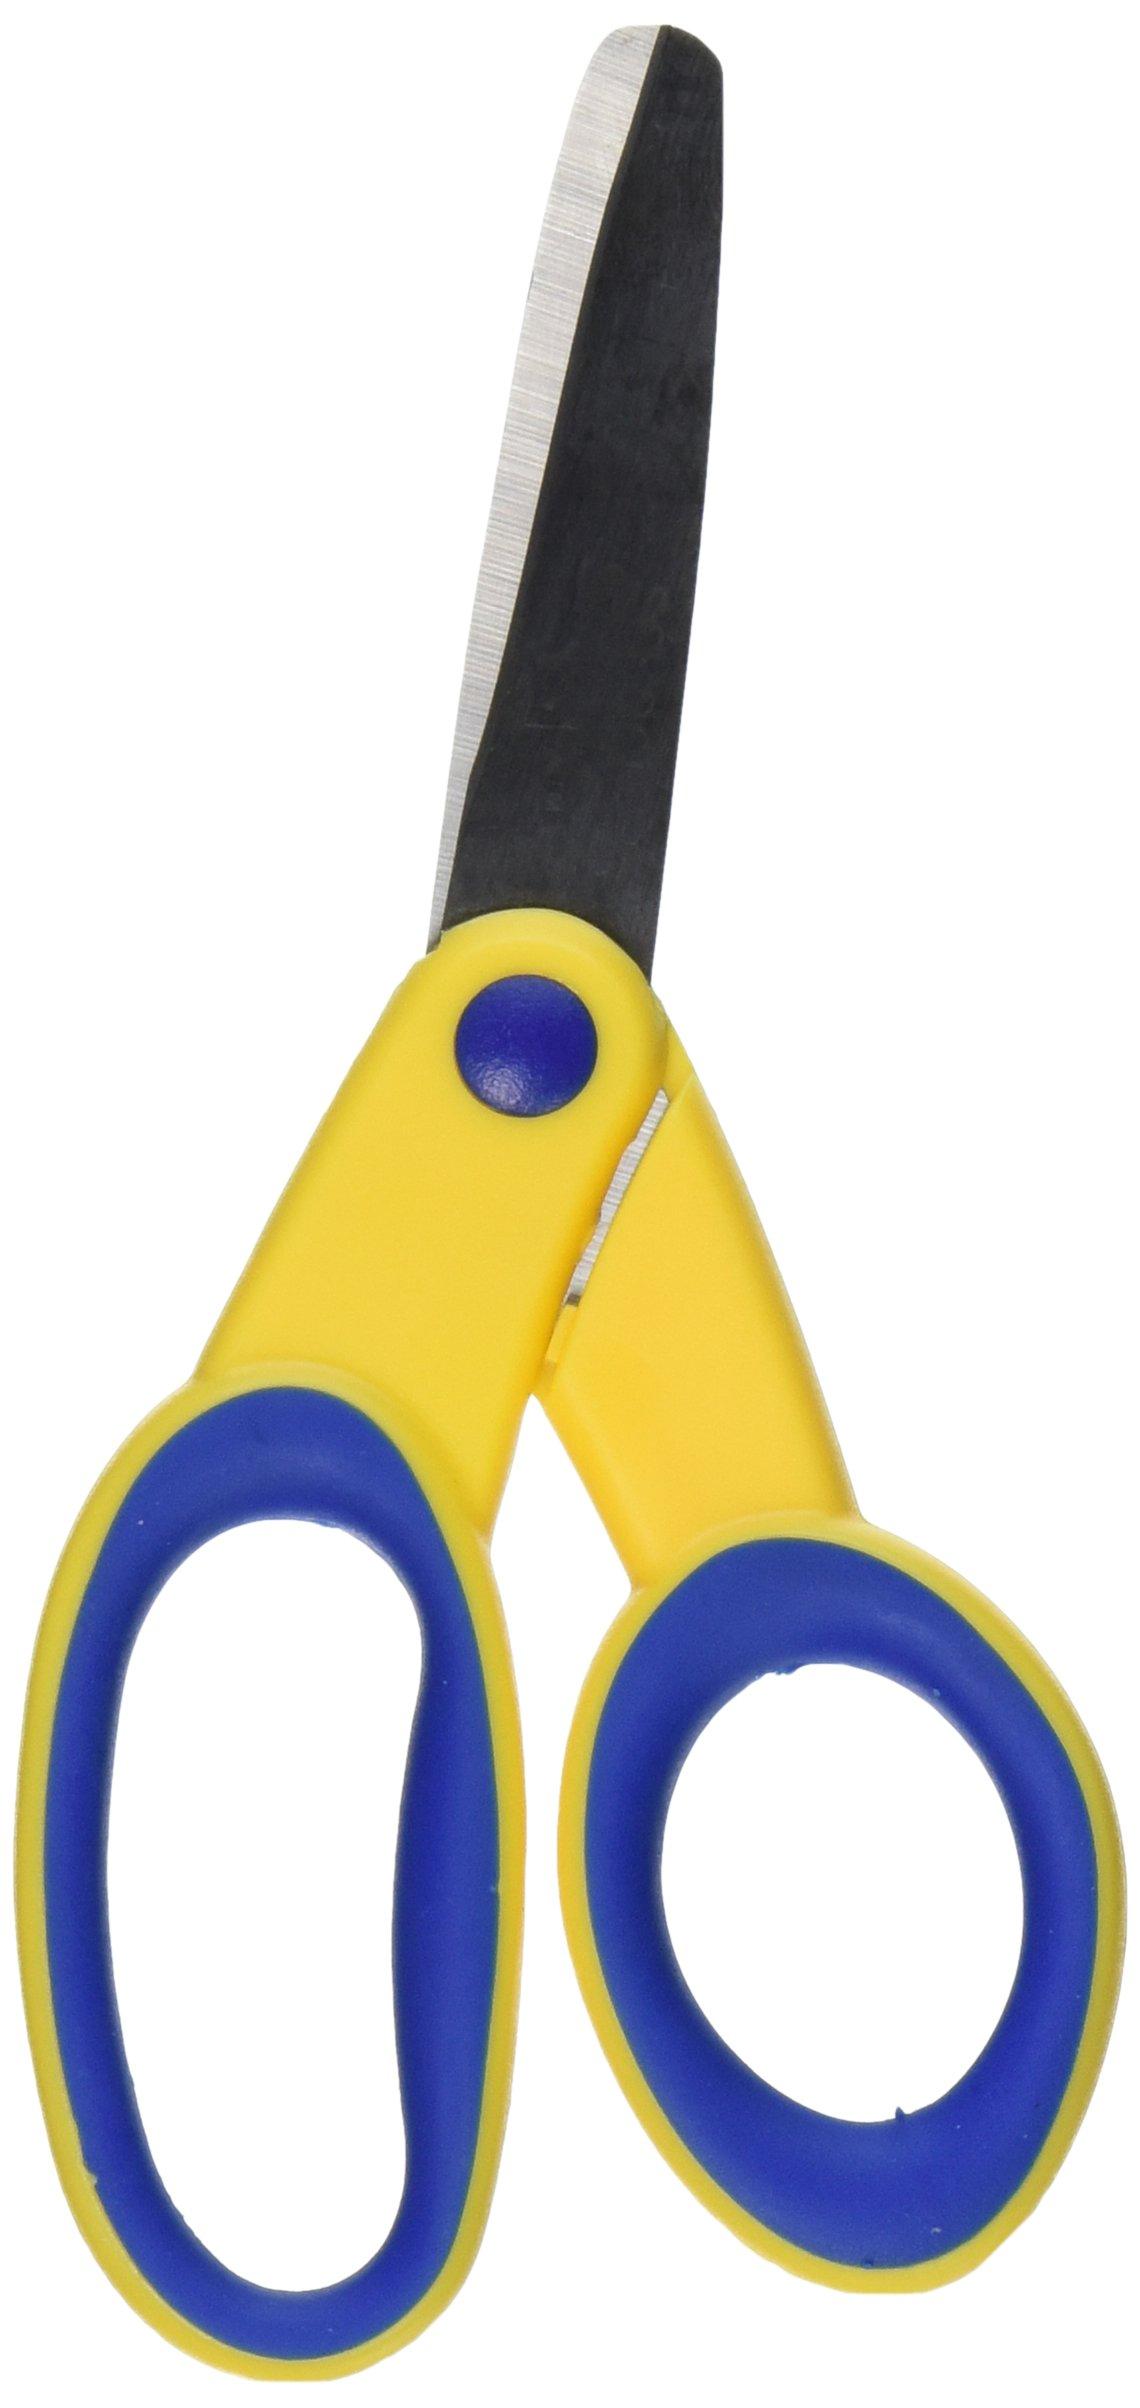 School Smart 86334 Kids Scissors - 5 inch Blunt - Lefty